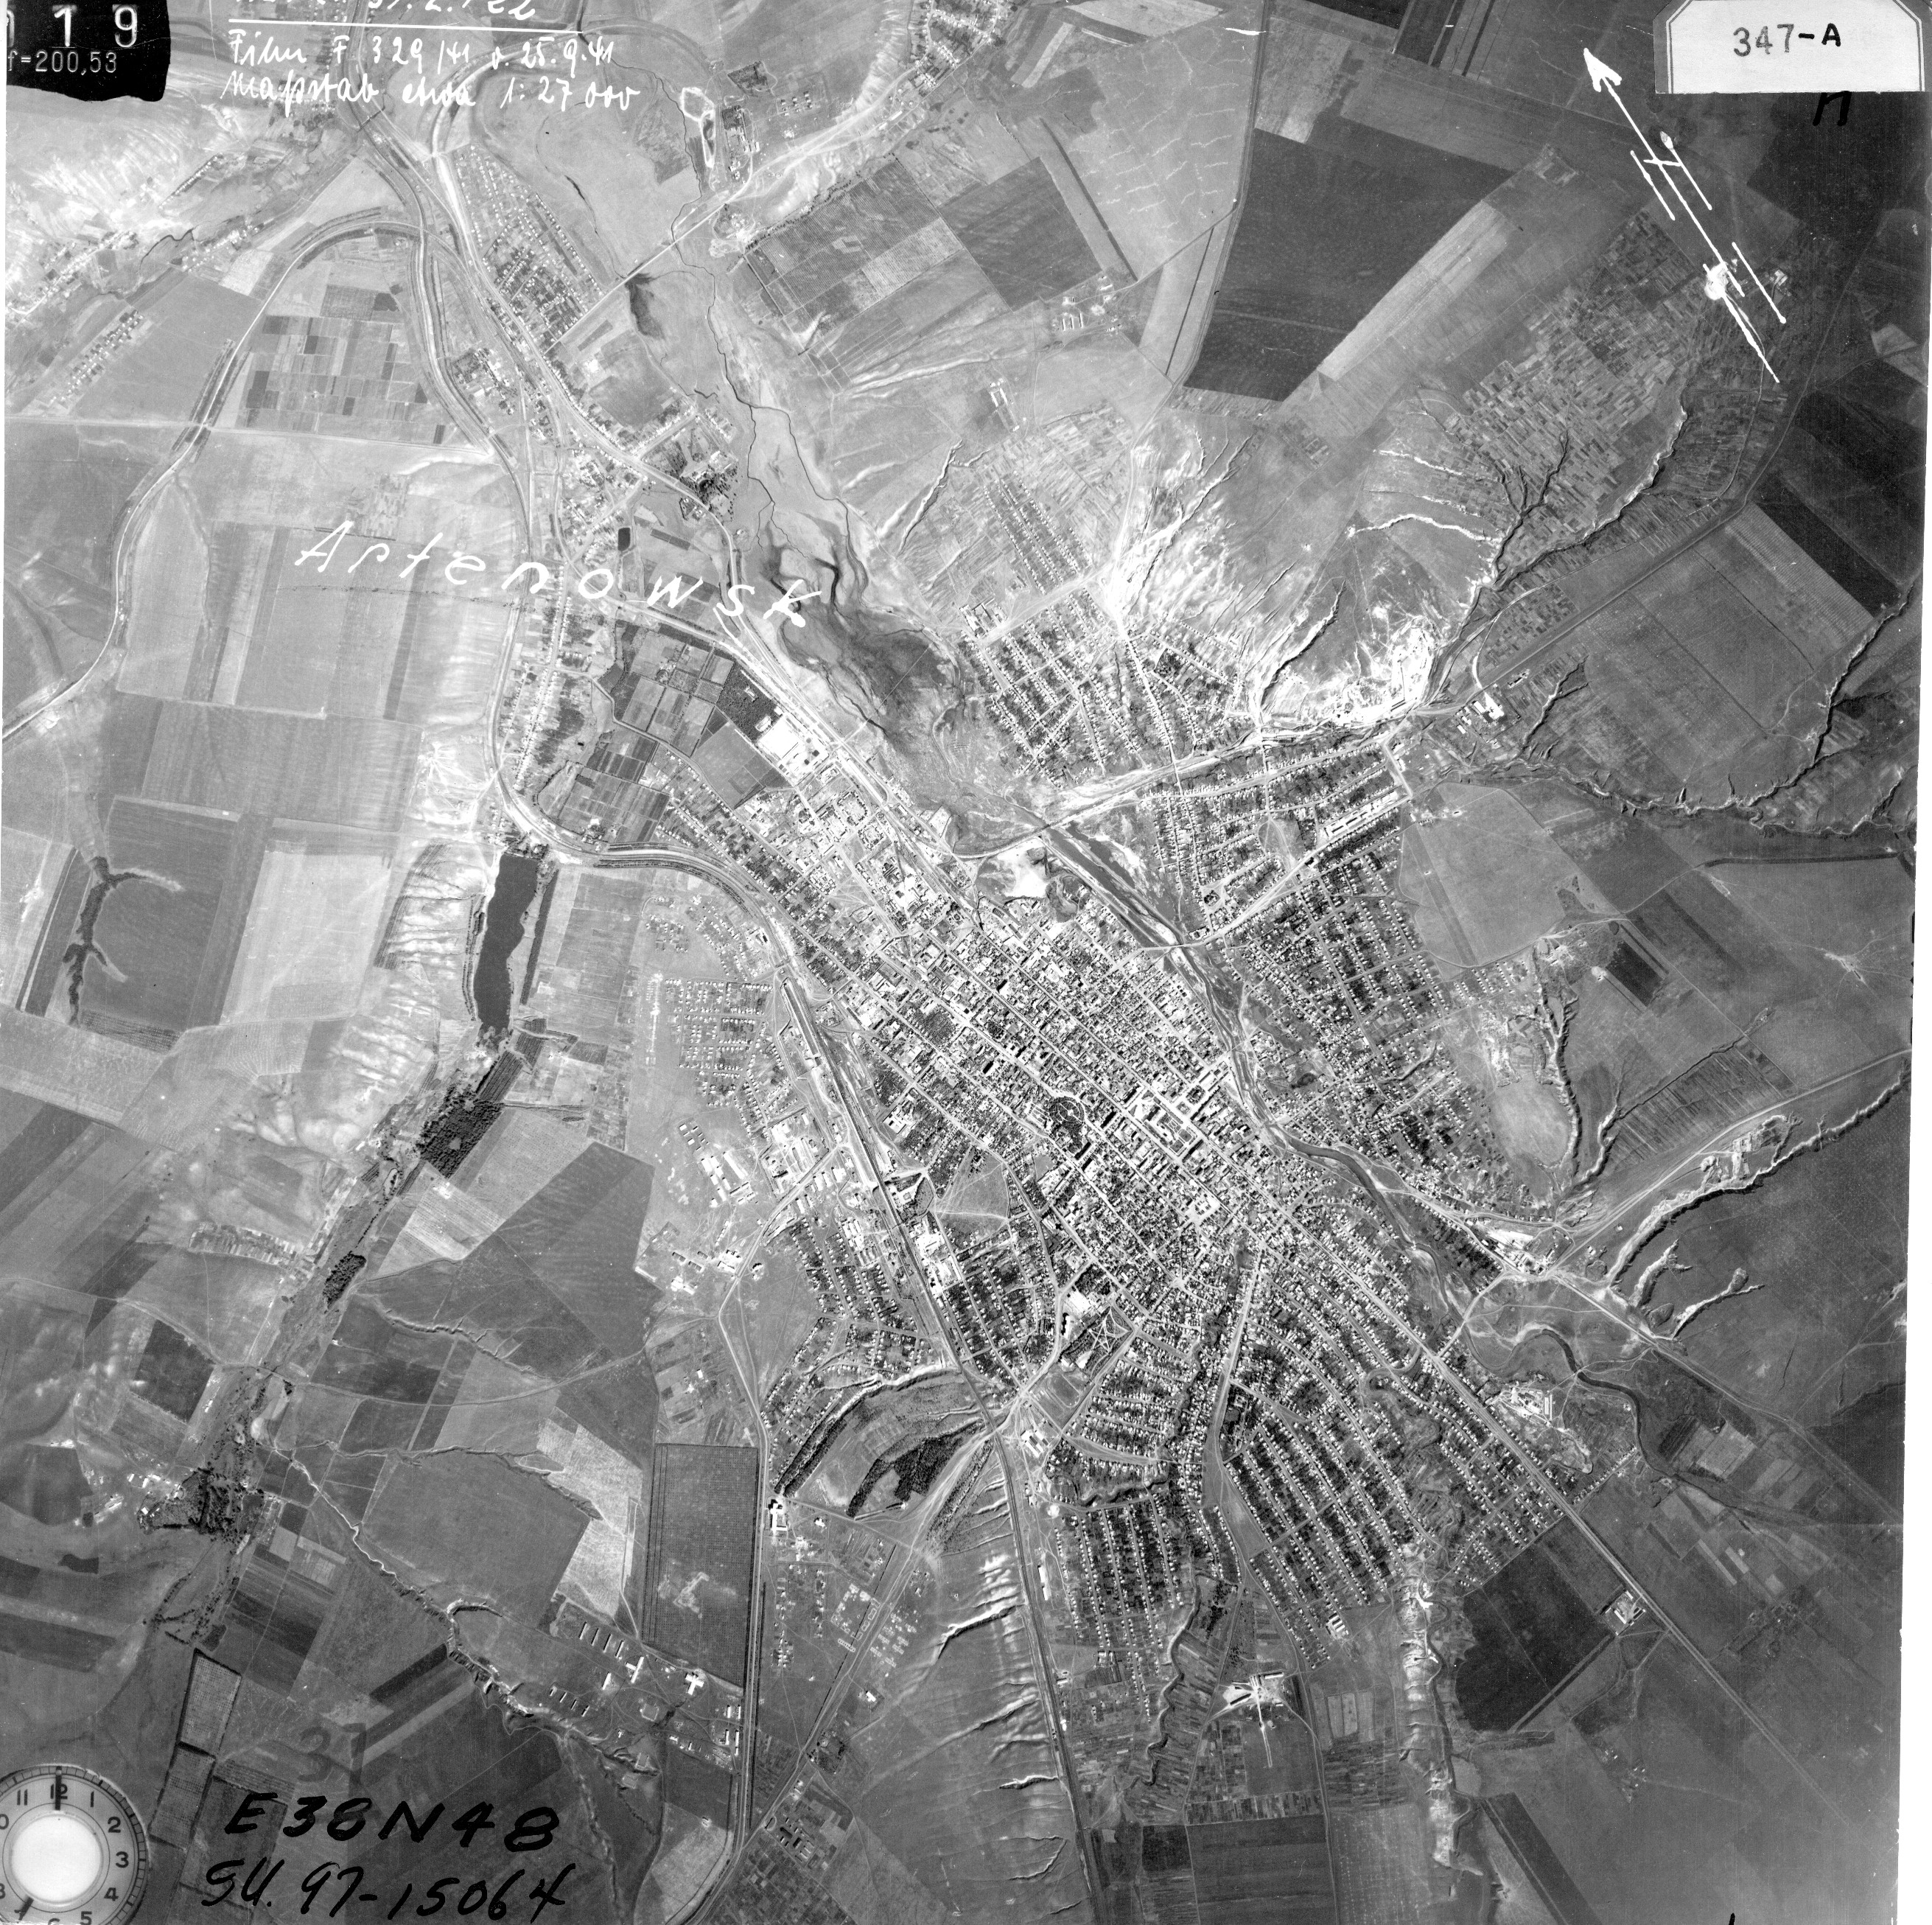 �������� ��������������. ���������, �������� 1941